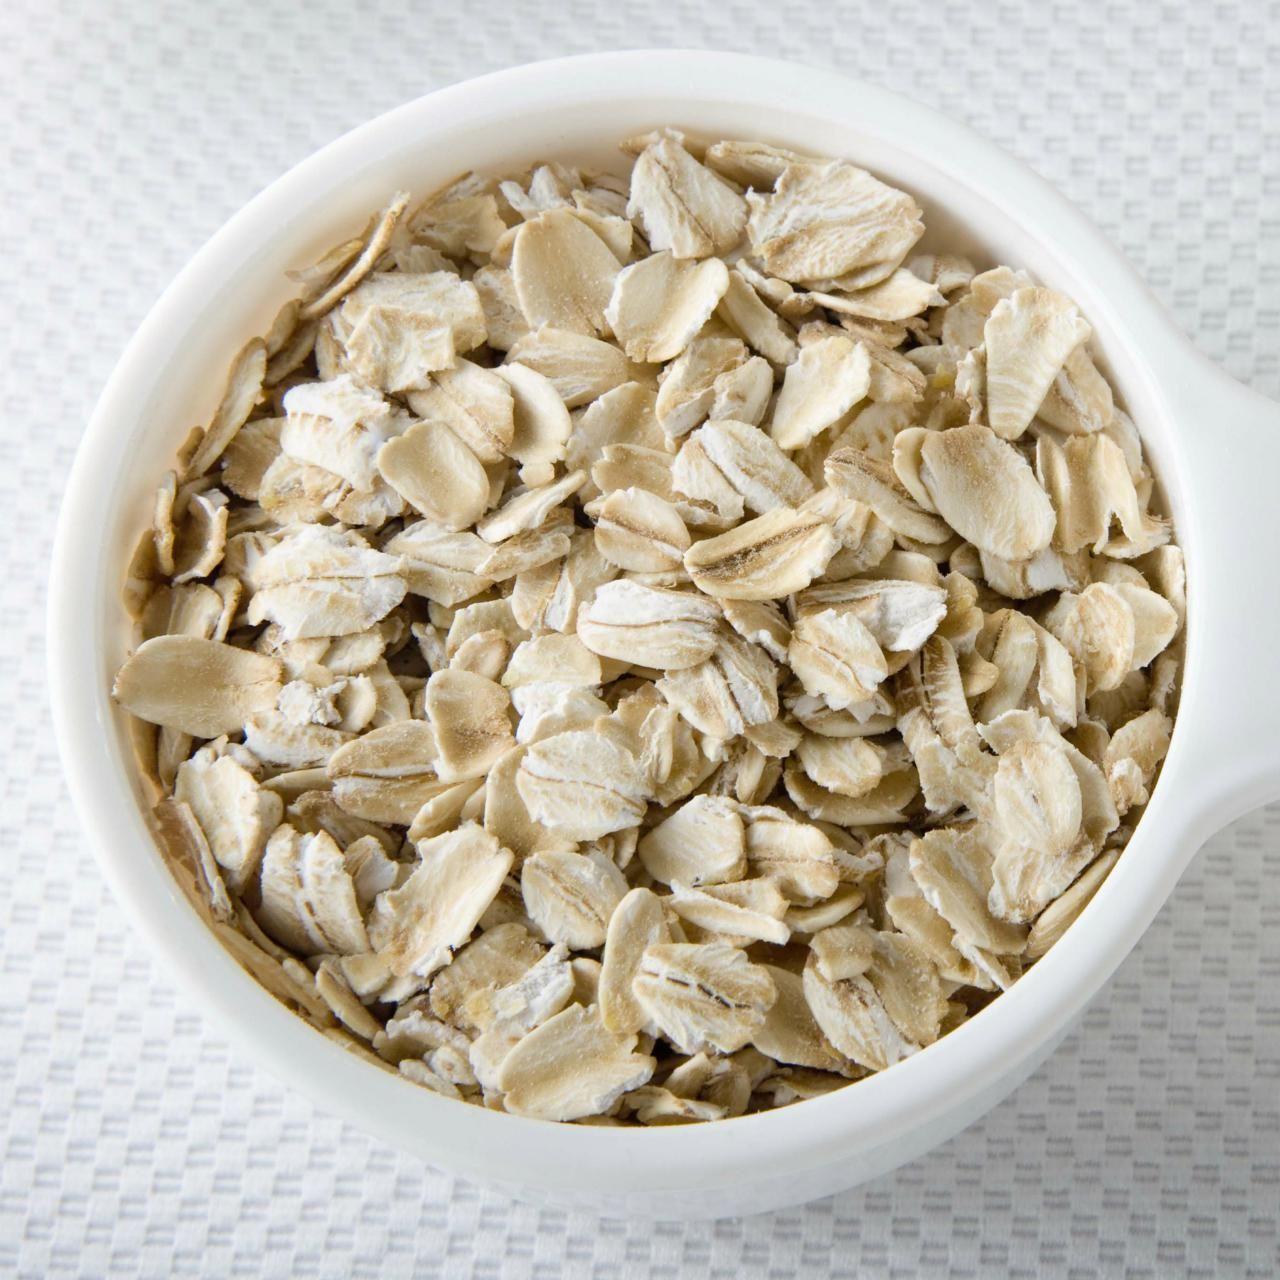 Oatmeal Face Mask Recipes Oatmeal Face Mask Face Masks And Masking